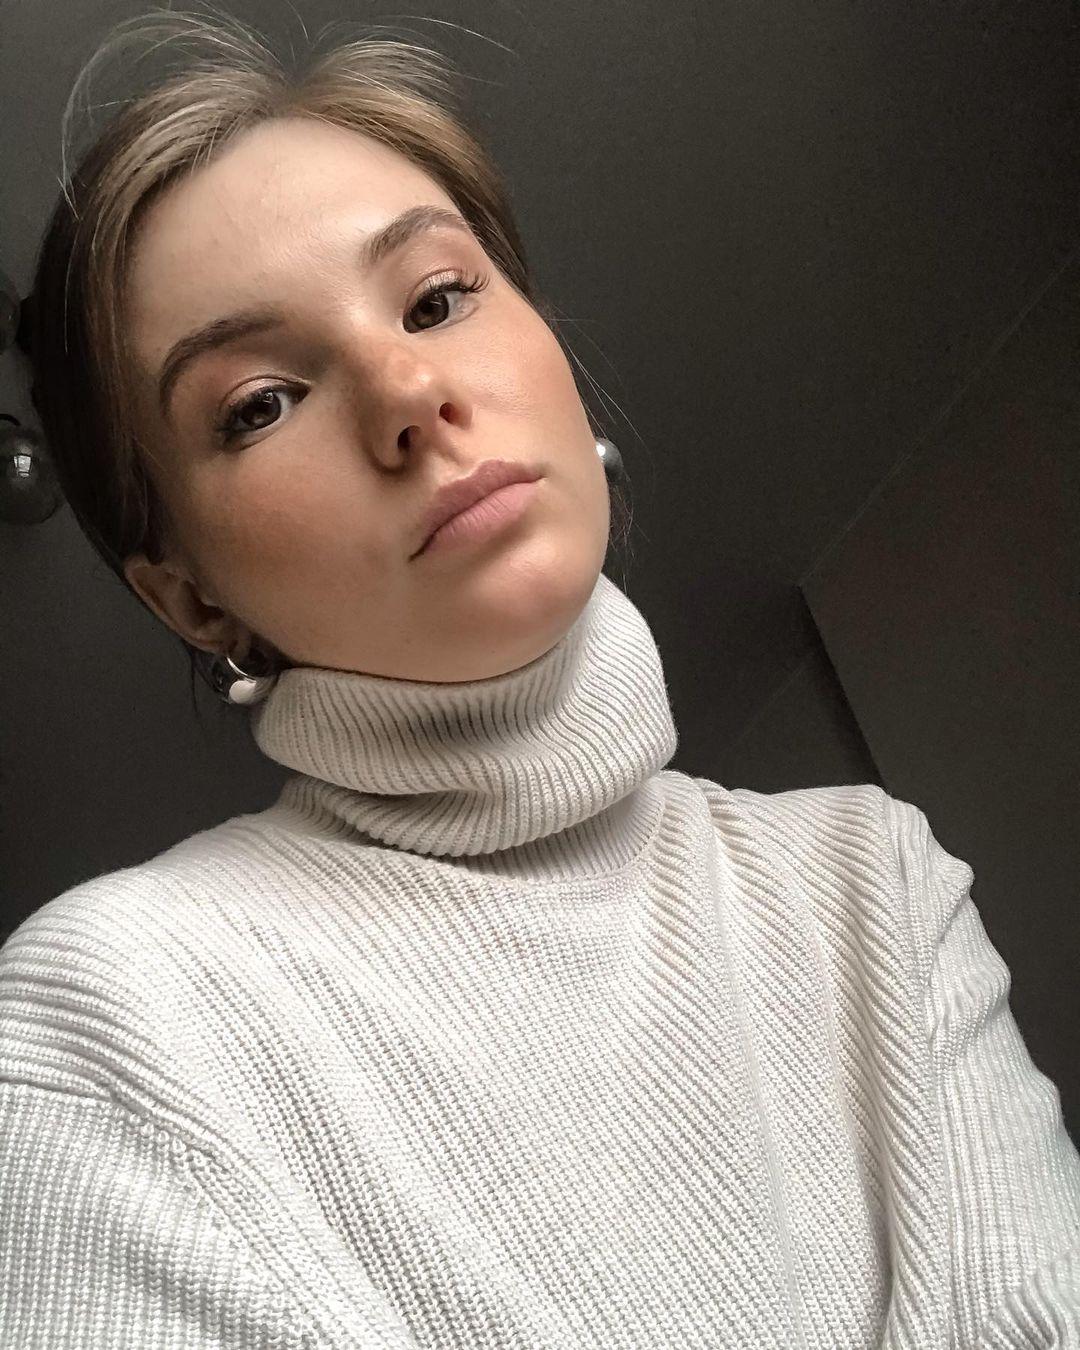 Anna-Kudinova-Wallpapers-Insta-Fit-Bio-10